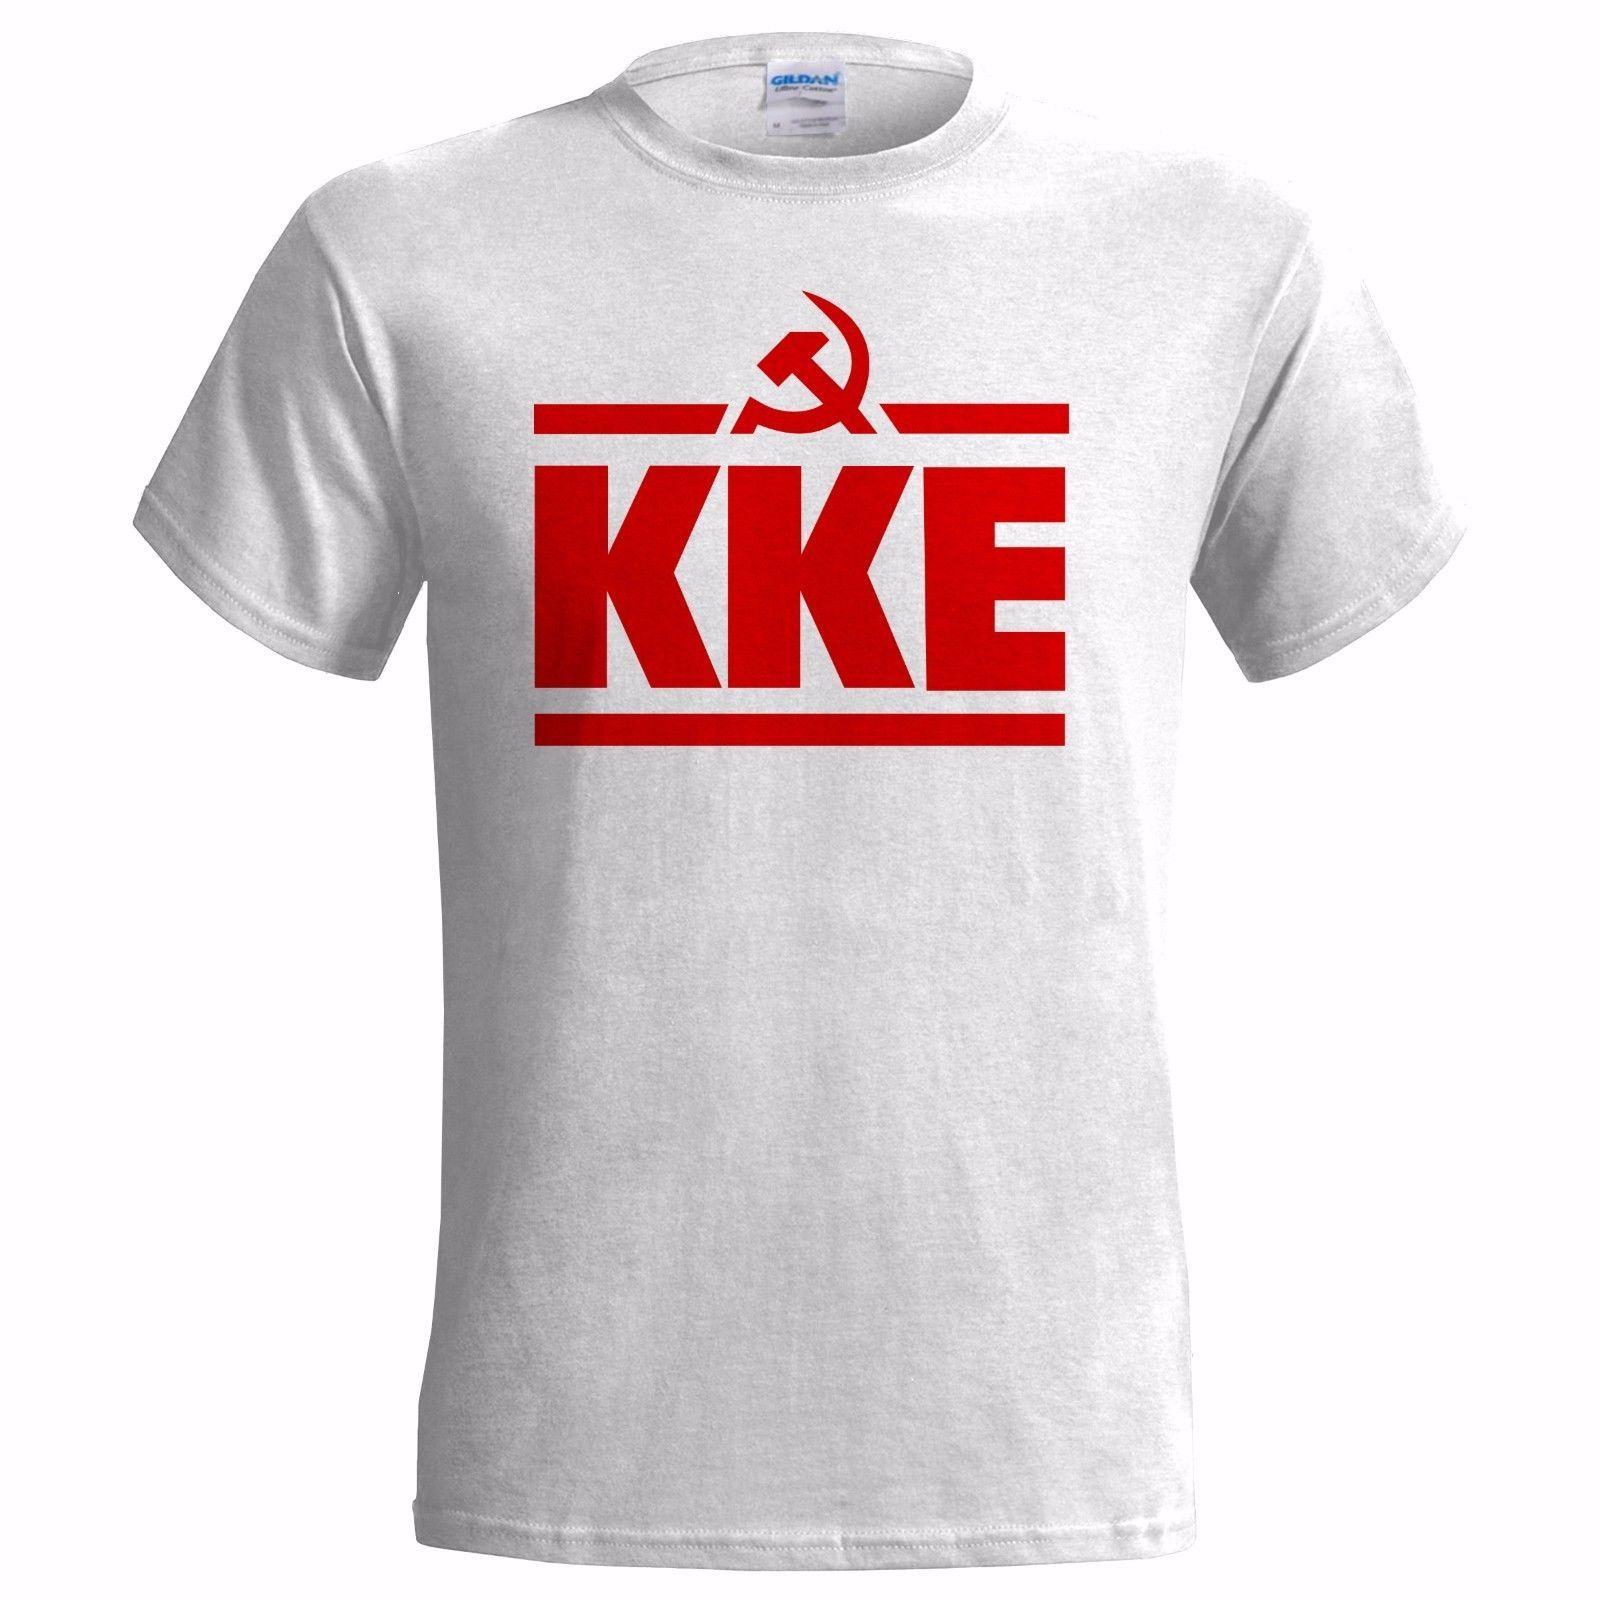 KKE LOGO MENS T SHIRT COMMUNIST GREECE GREEK PARTY COMMUNISM FREEDOM  ANARCHYFunny free shipping Unisex Casual top